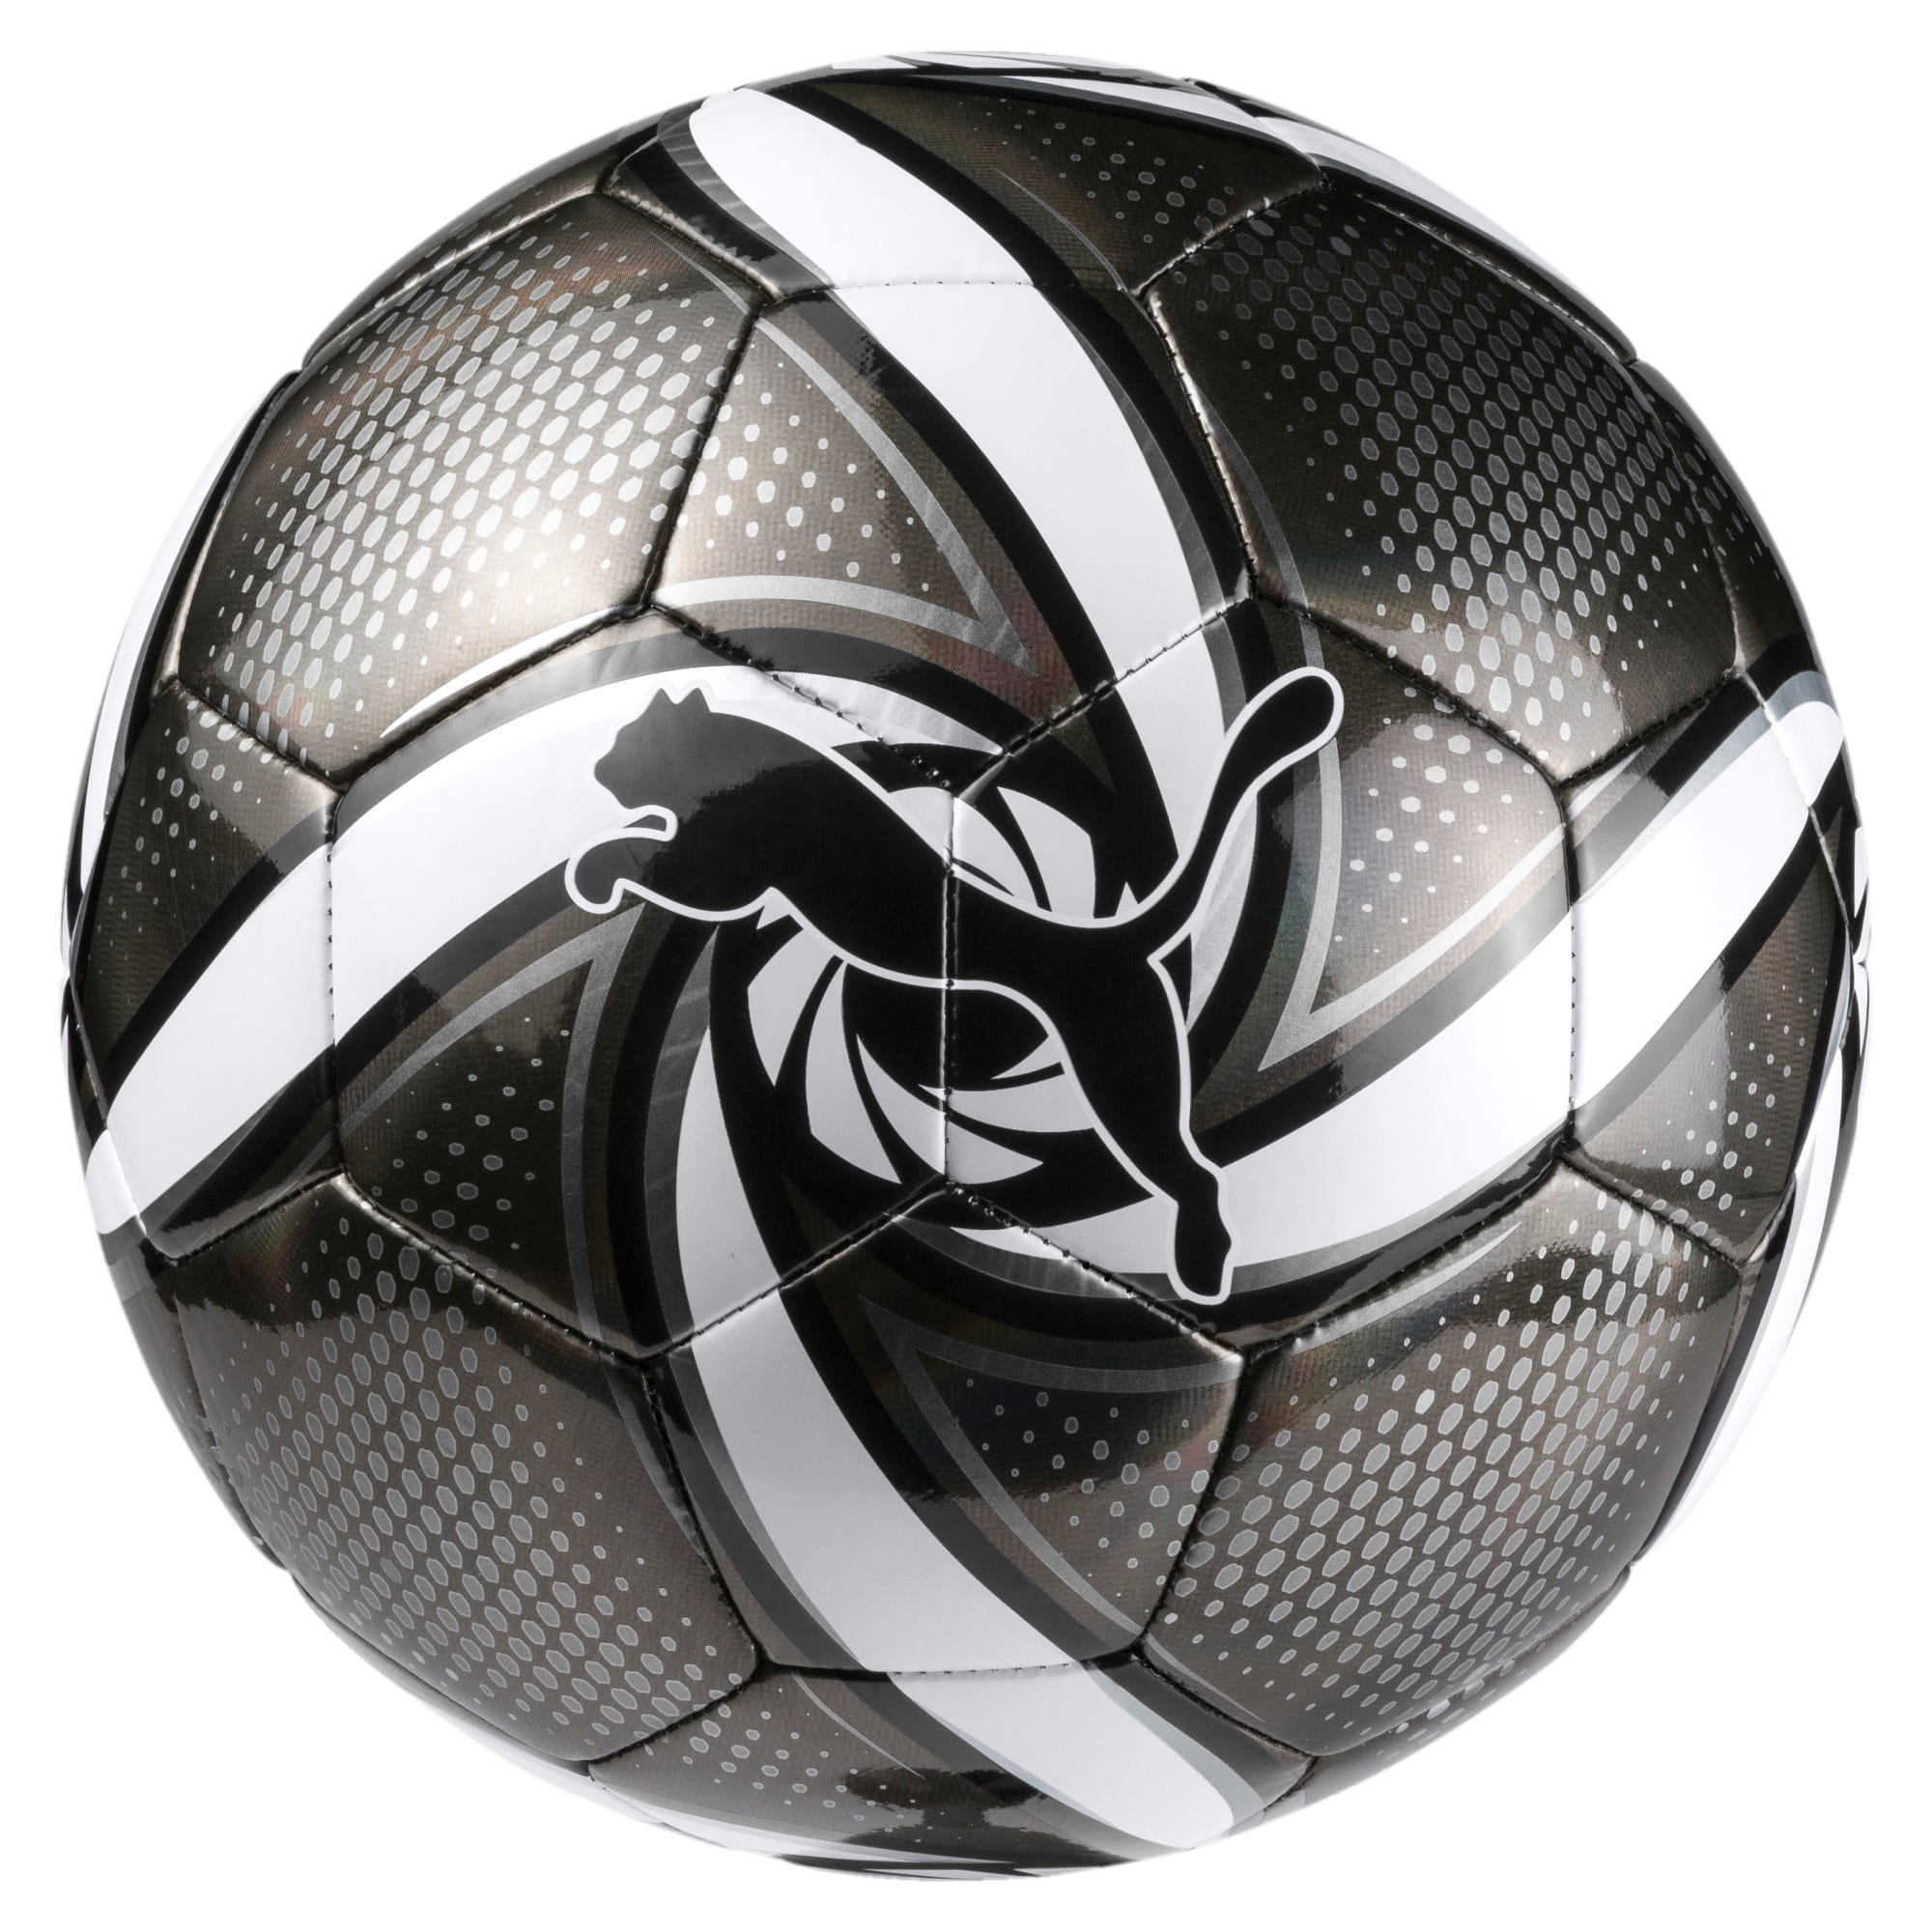 Thumbnail 1 of FUTURE Flare Ball, Puma Black-Puma White-Silver, medium